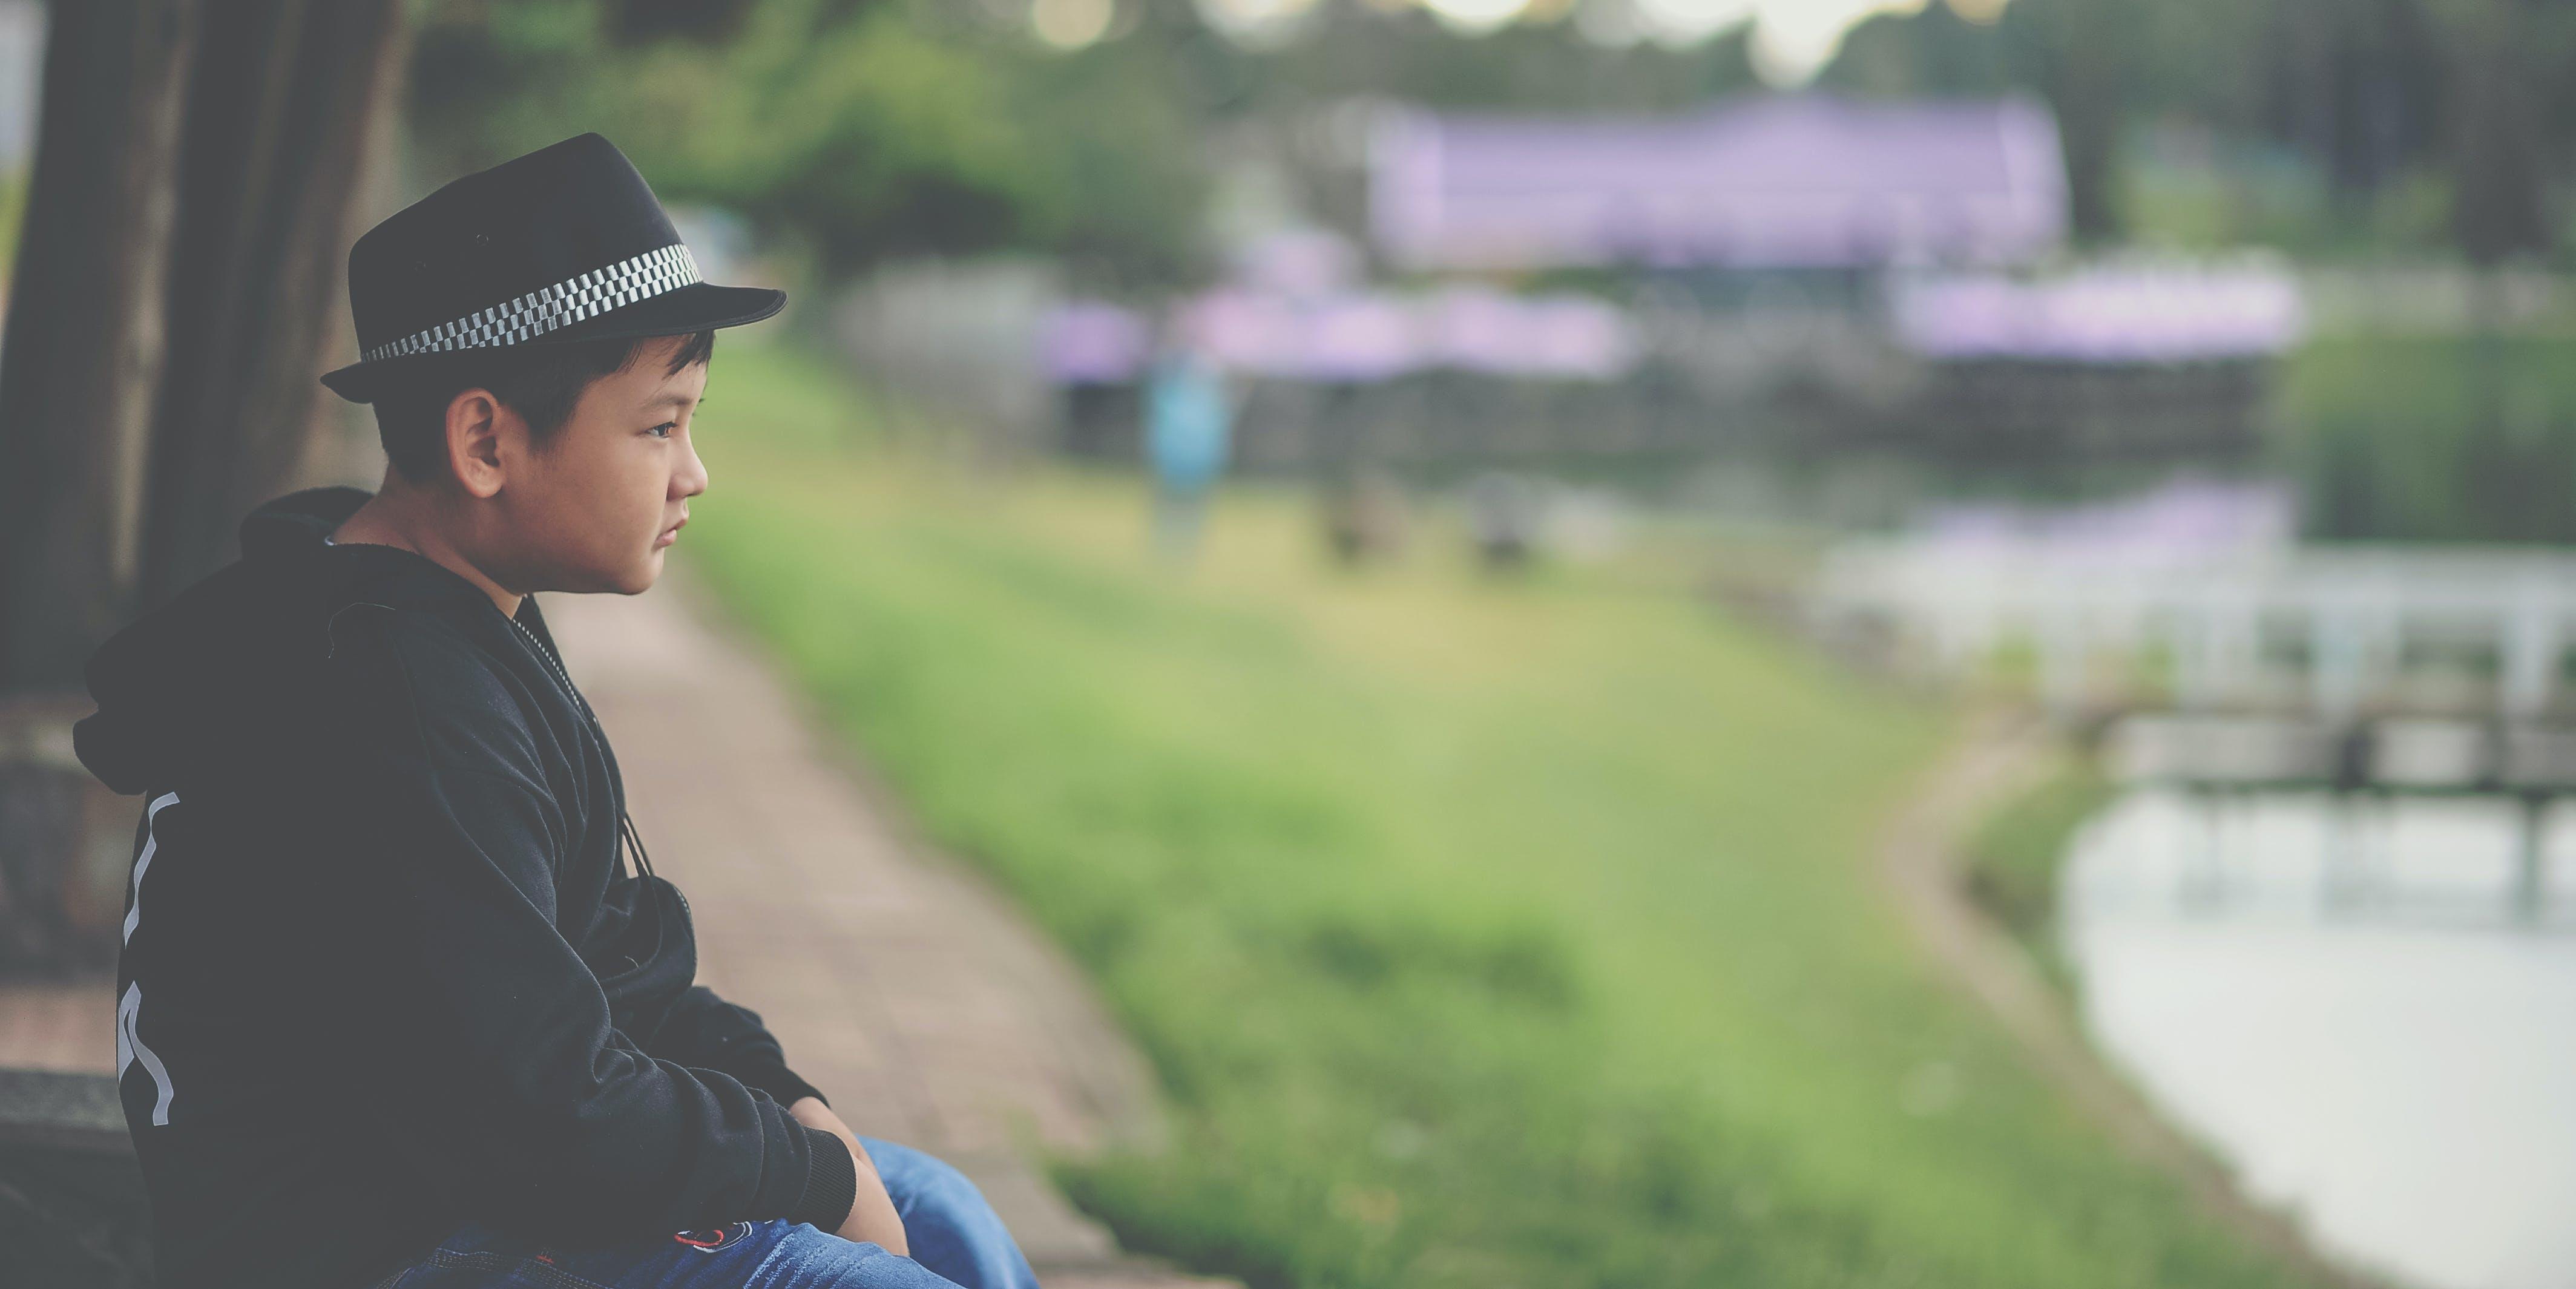 Boy in Black Jacket and Black Fedora Hat Sitting Near Body of Water